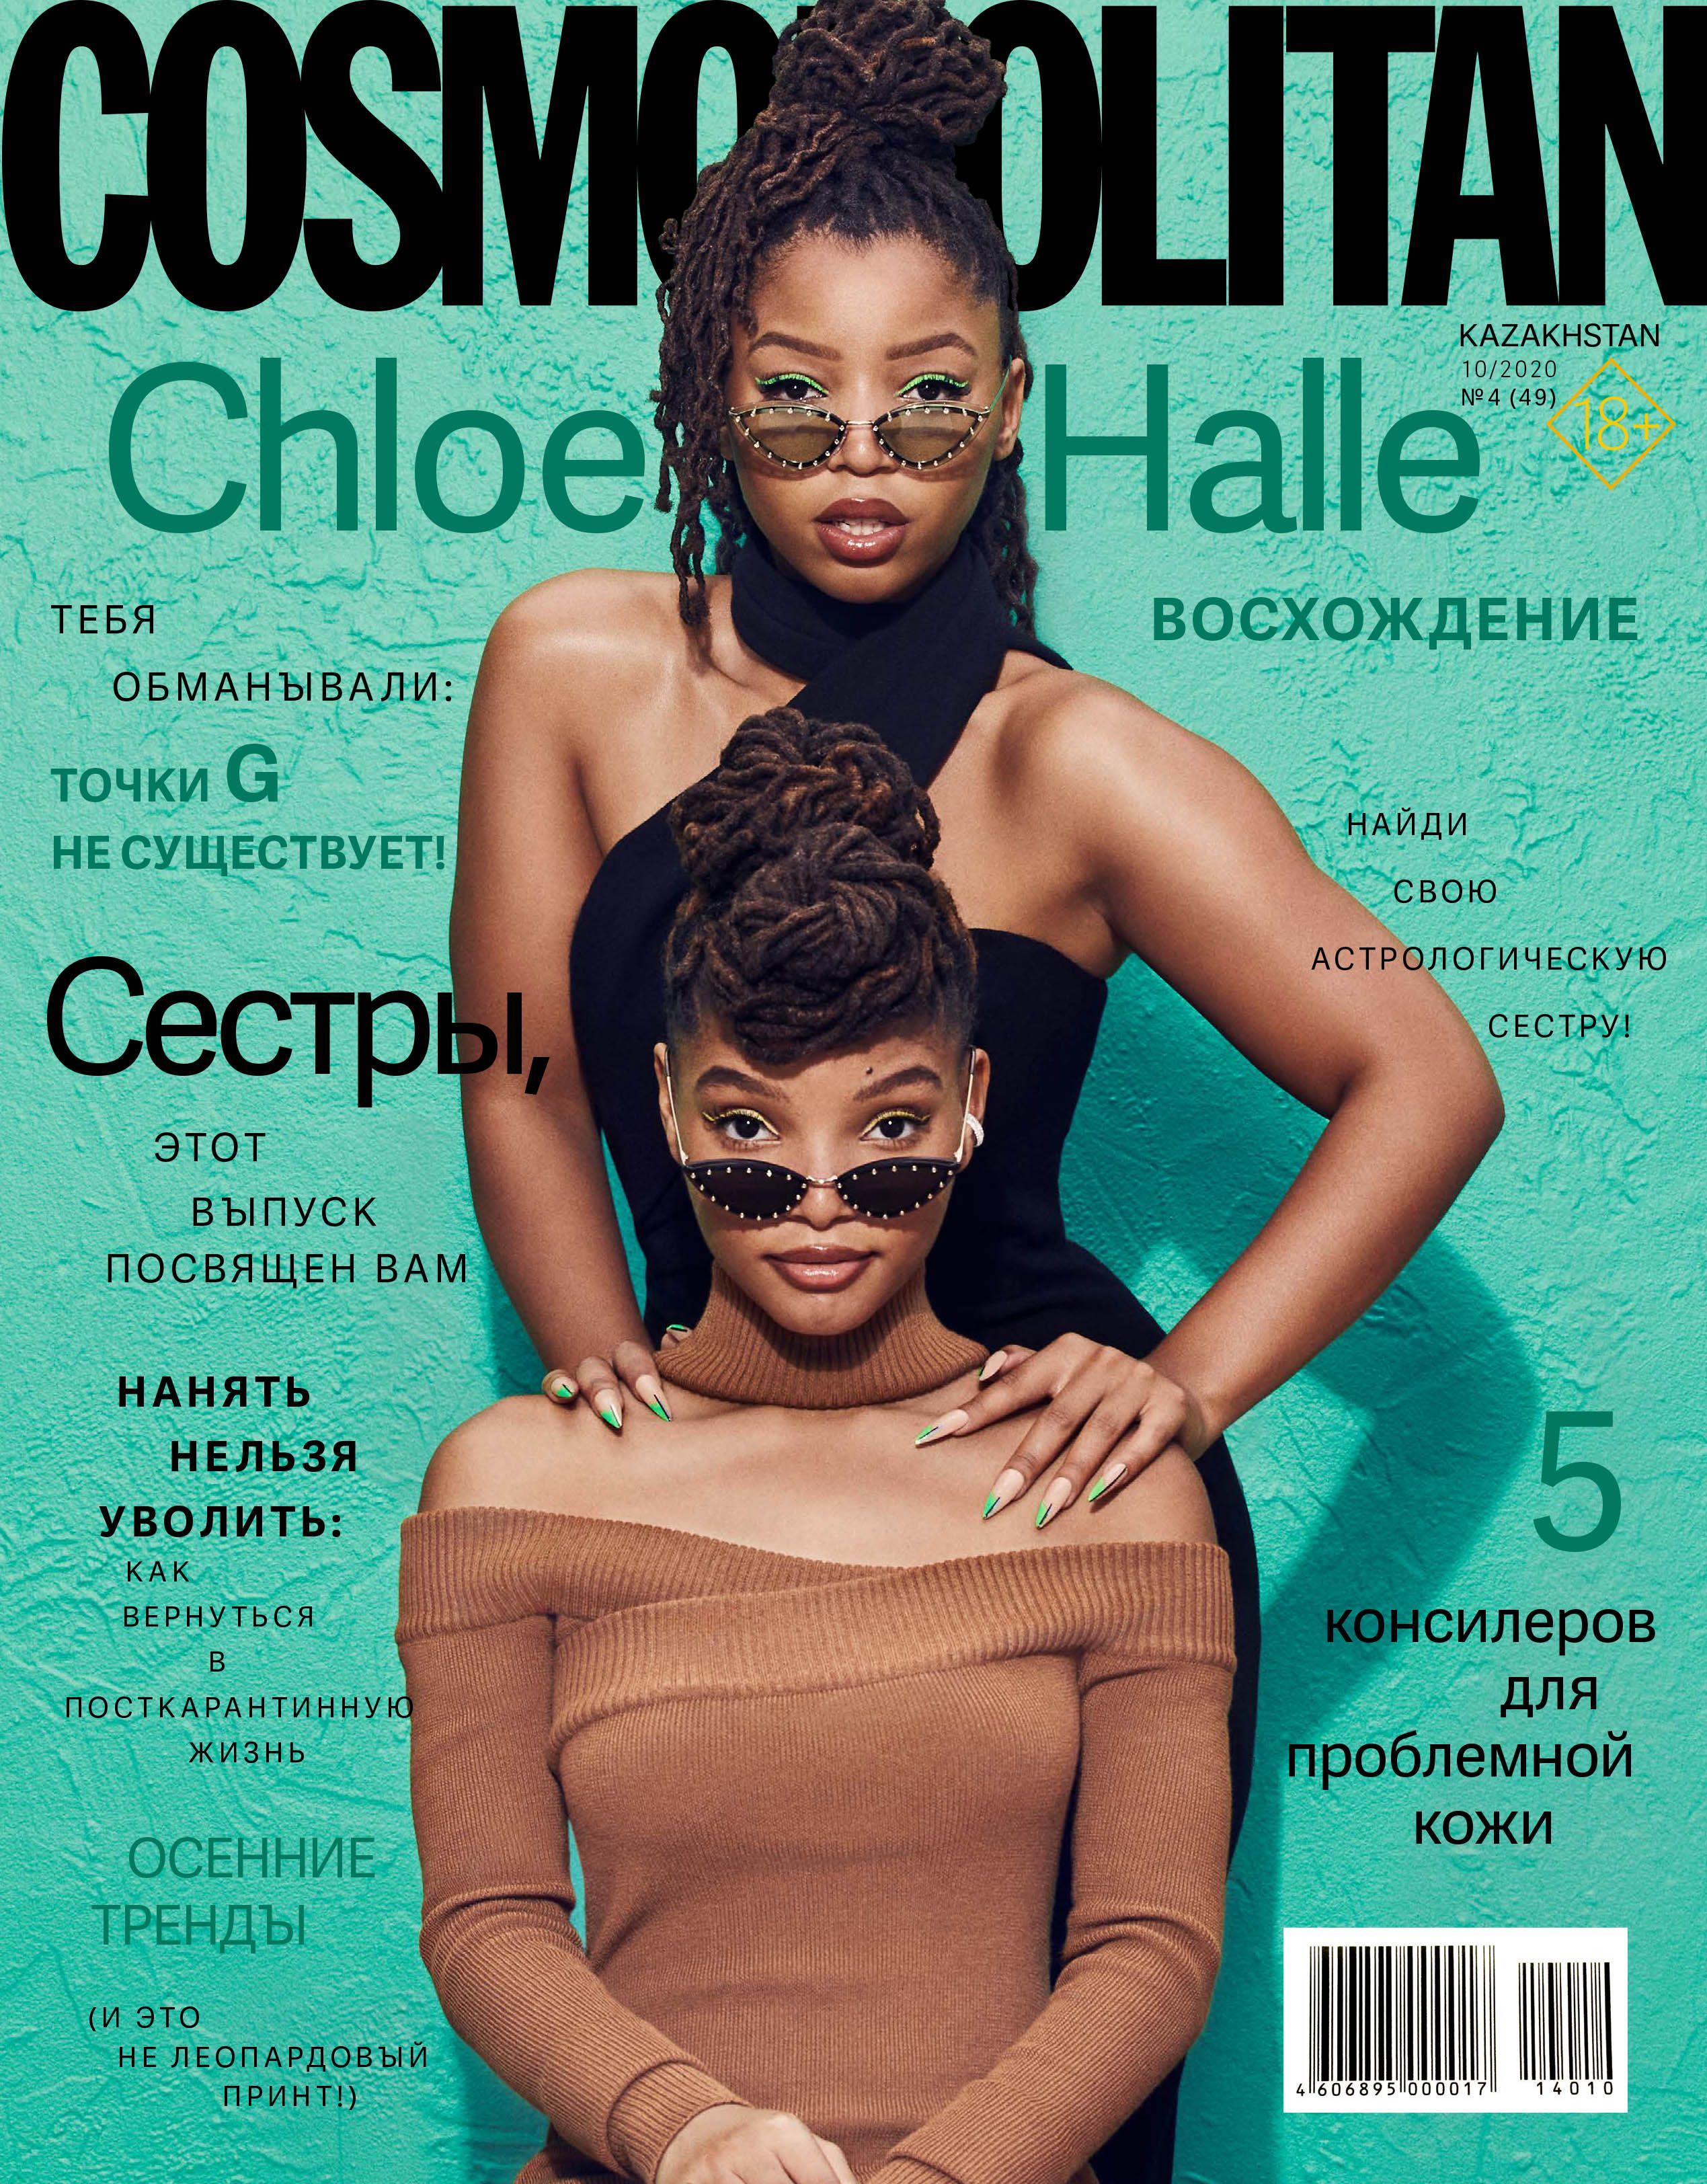 Cosmopolitan Kazakstan October 20